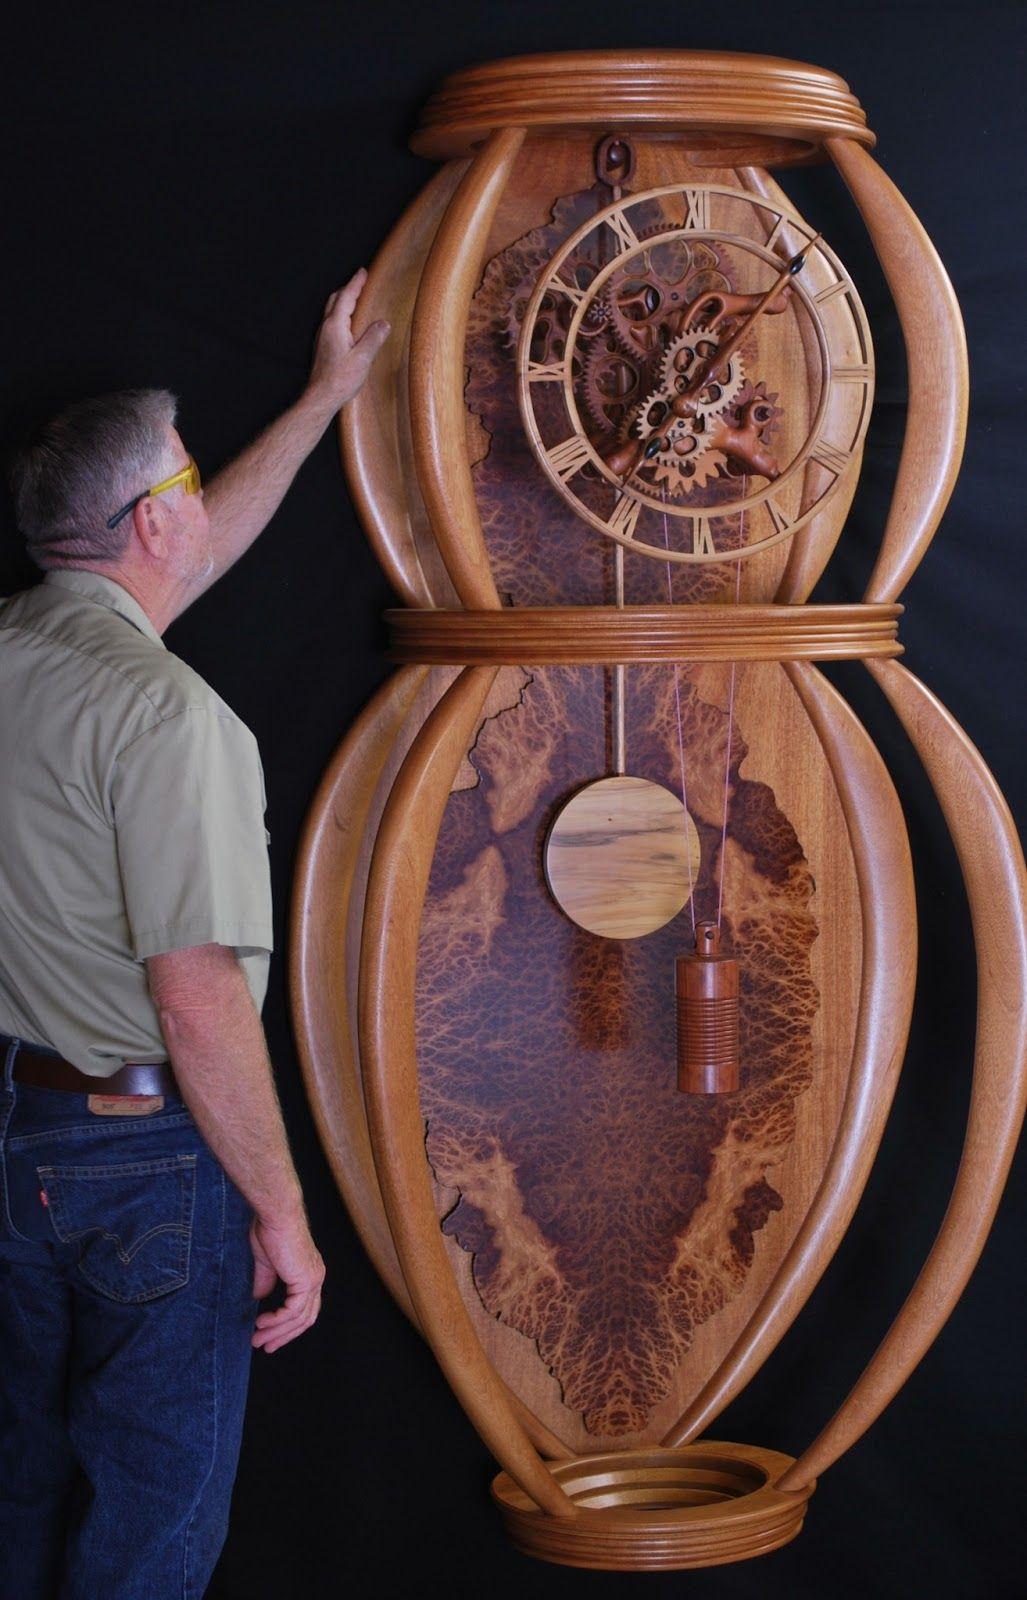 Gary Johnson S Handmade Wood Clocks Wooden Gear Clock